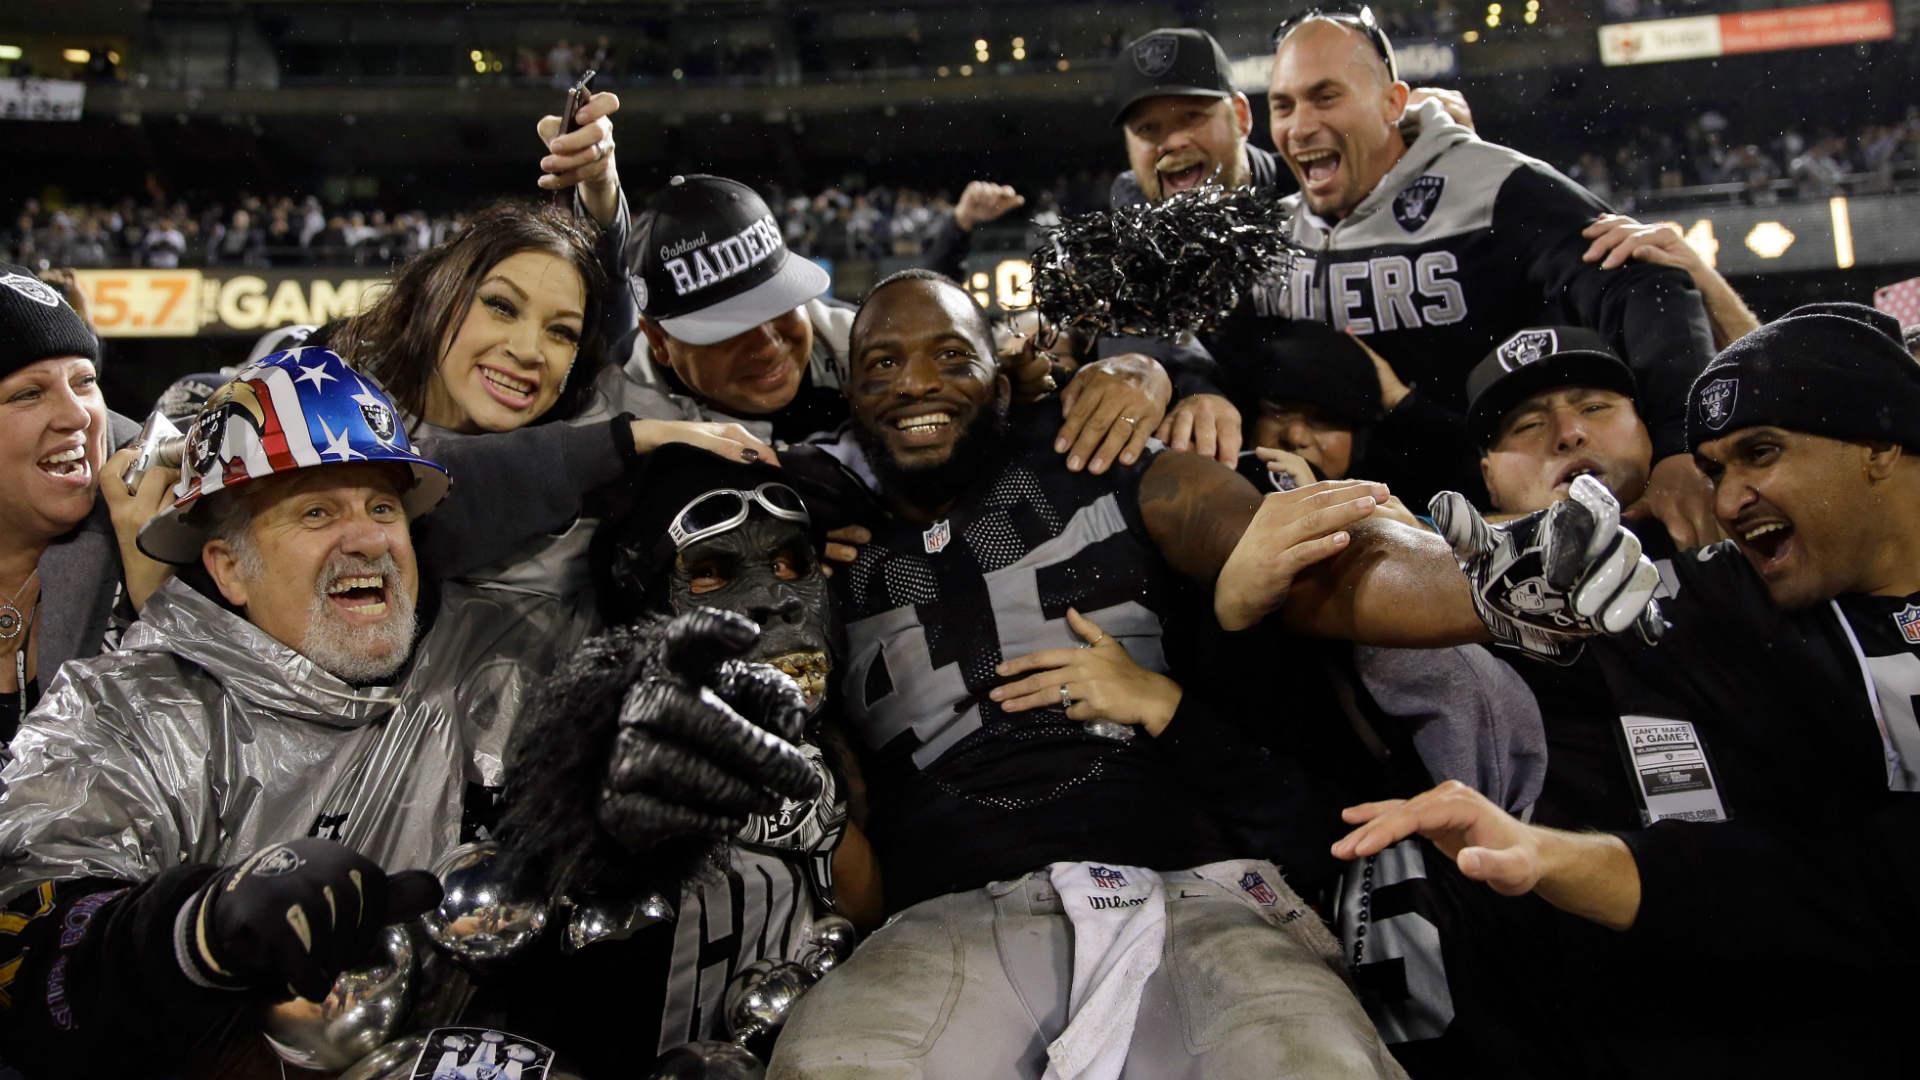 Raiders-fans-4262016-us-news-getty-ftr_ma1kznom8wun18qokp41uidfm